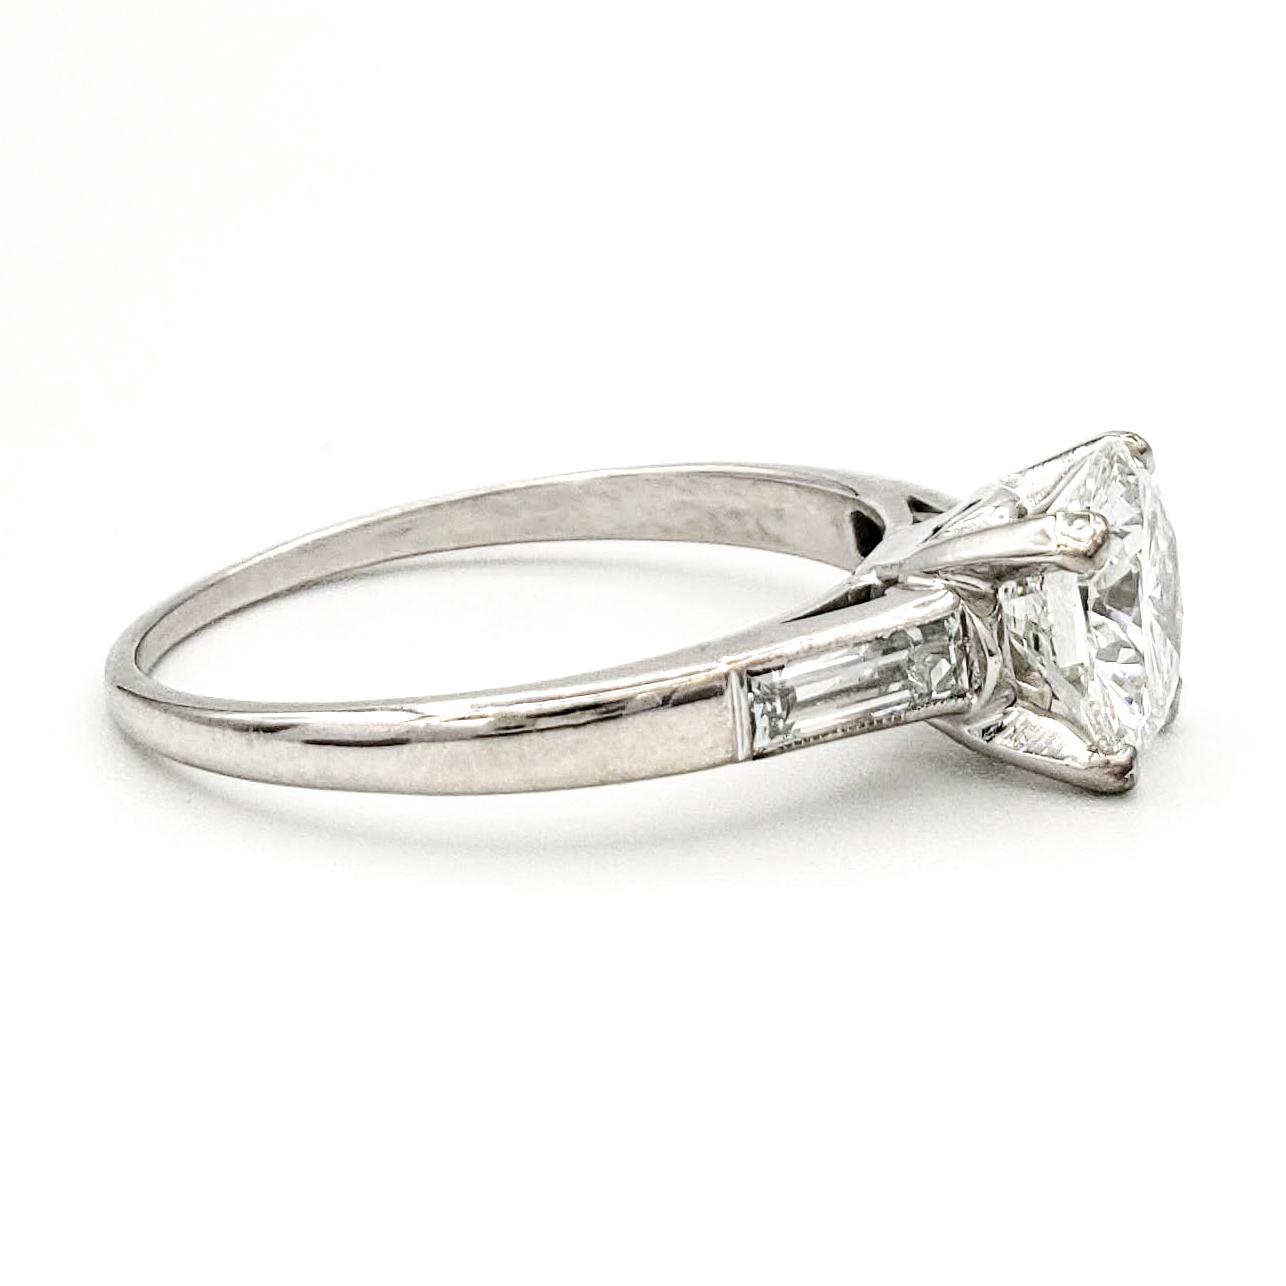 vintage-platinum-engagement-ring-with-1-06-carat-round-brilliant-cut-diamond-gia-g-vs1